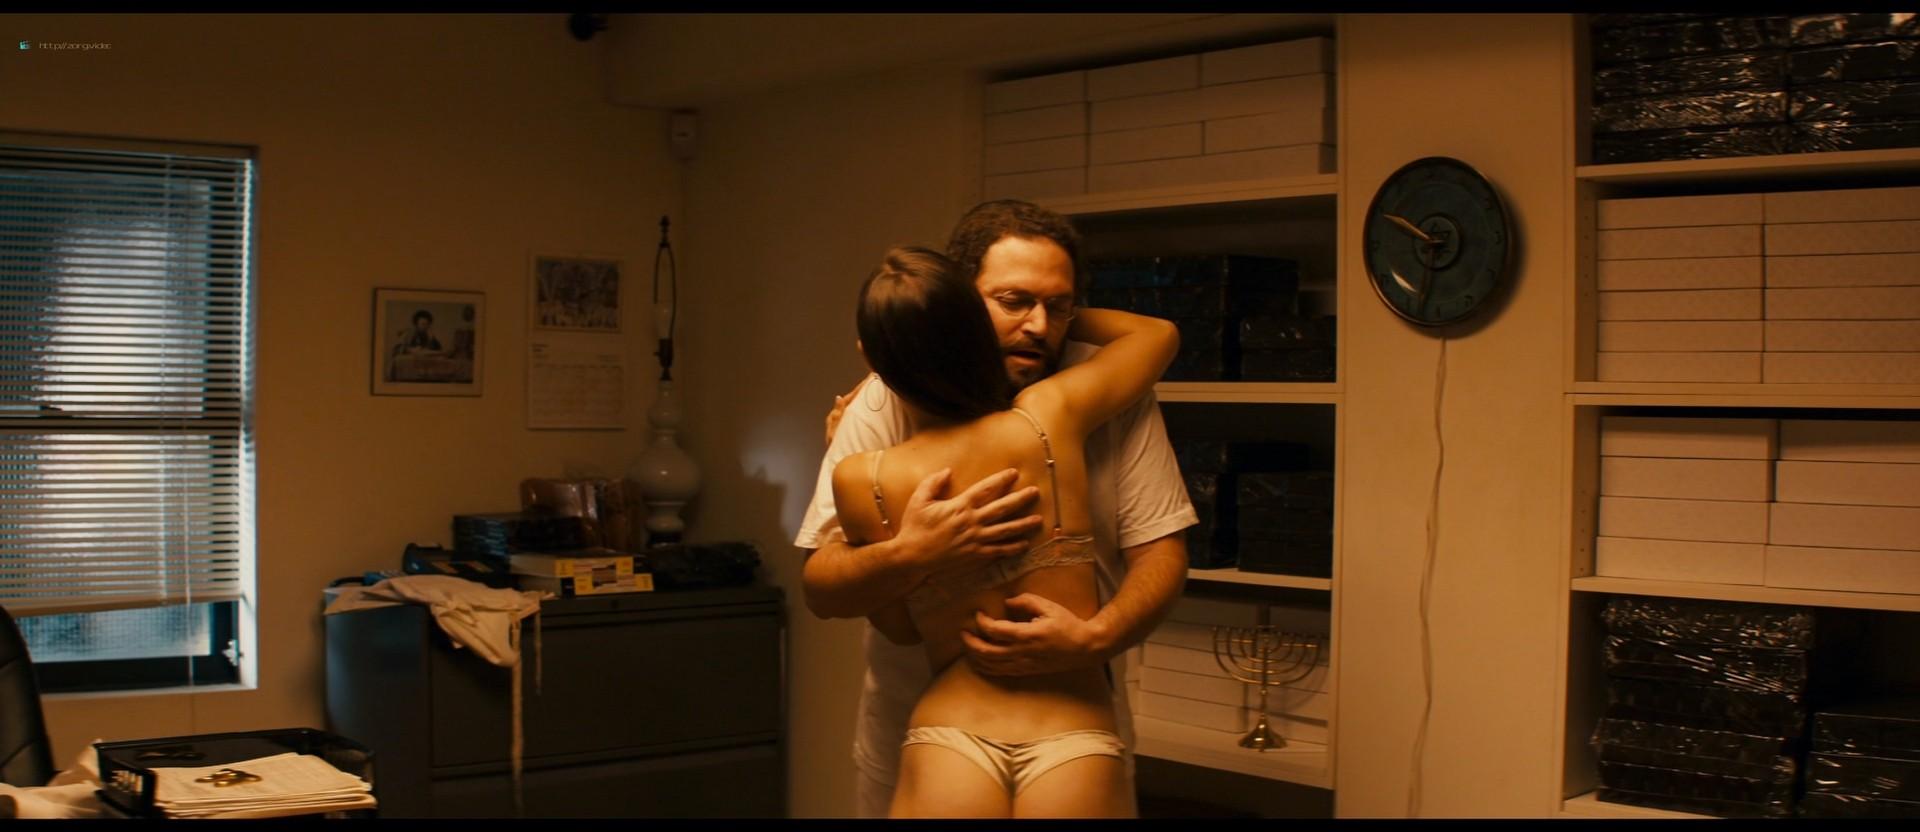 Sasha Grey nude full frontal - The Girlfriend Experience (2009) HD 1080p BluRay (2)